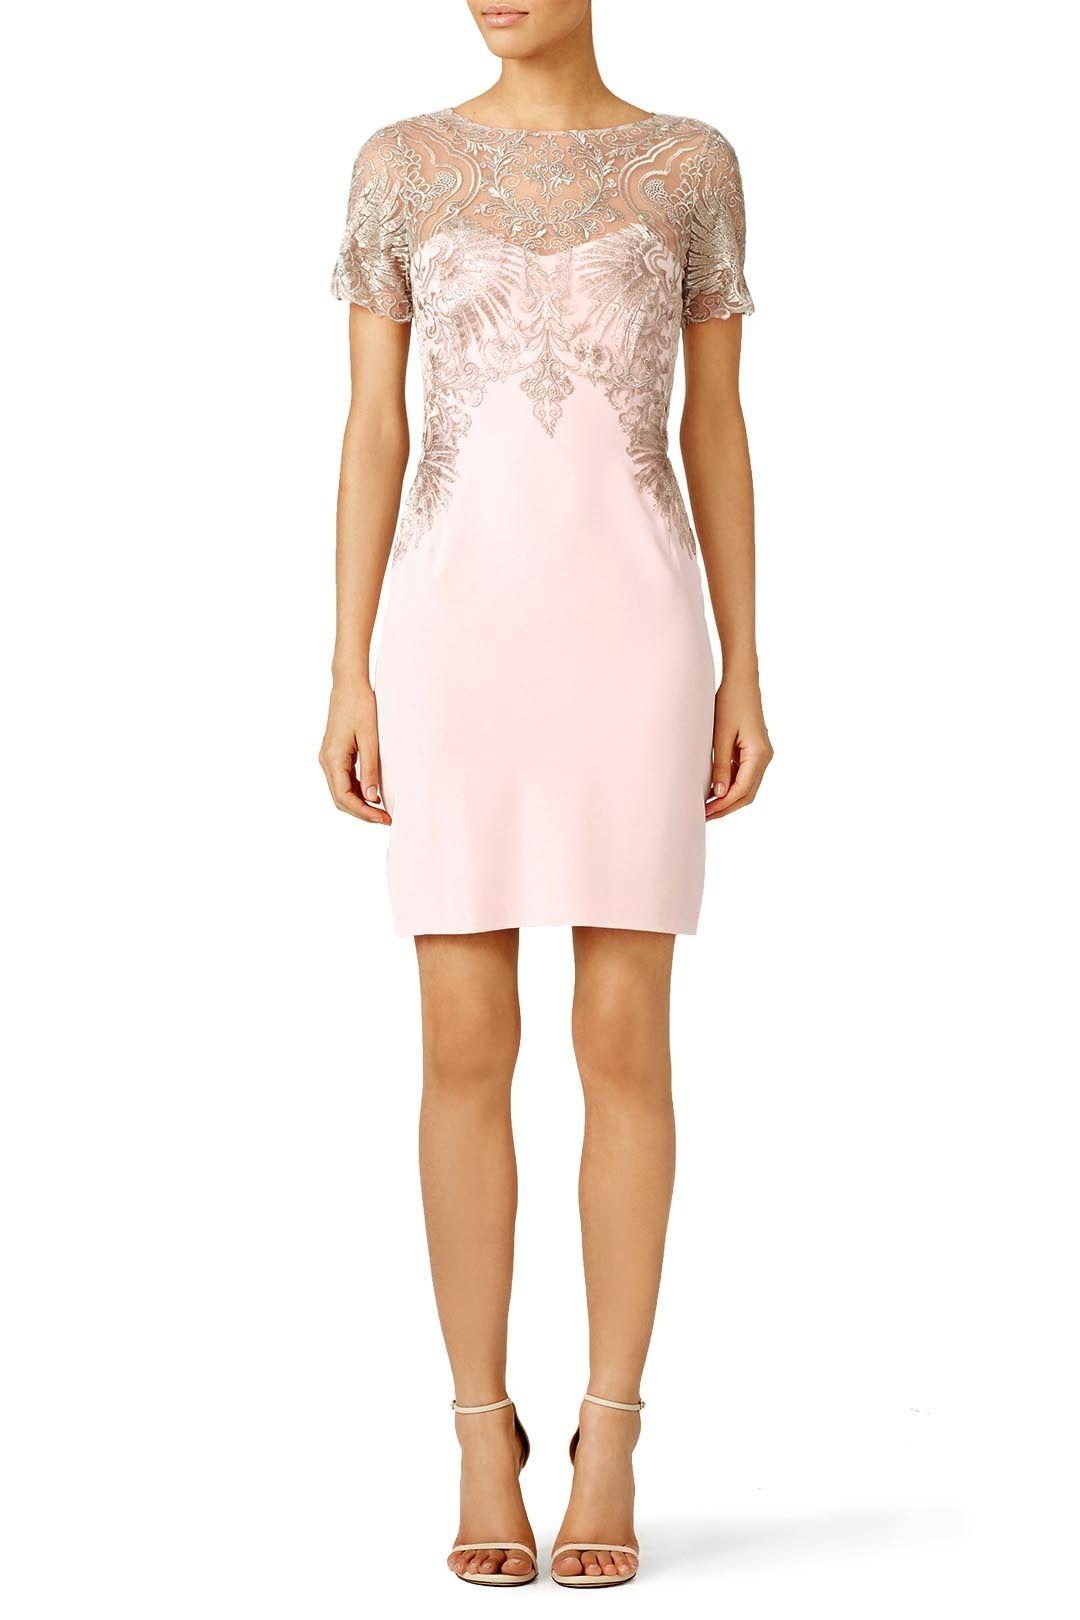 Marchesa Notte Blush Buckingham Sheath Semi Formal Dresses For Wedding Dresses Dress To Impress [ 1620 x 1080 Pixel ]